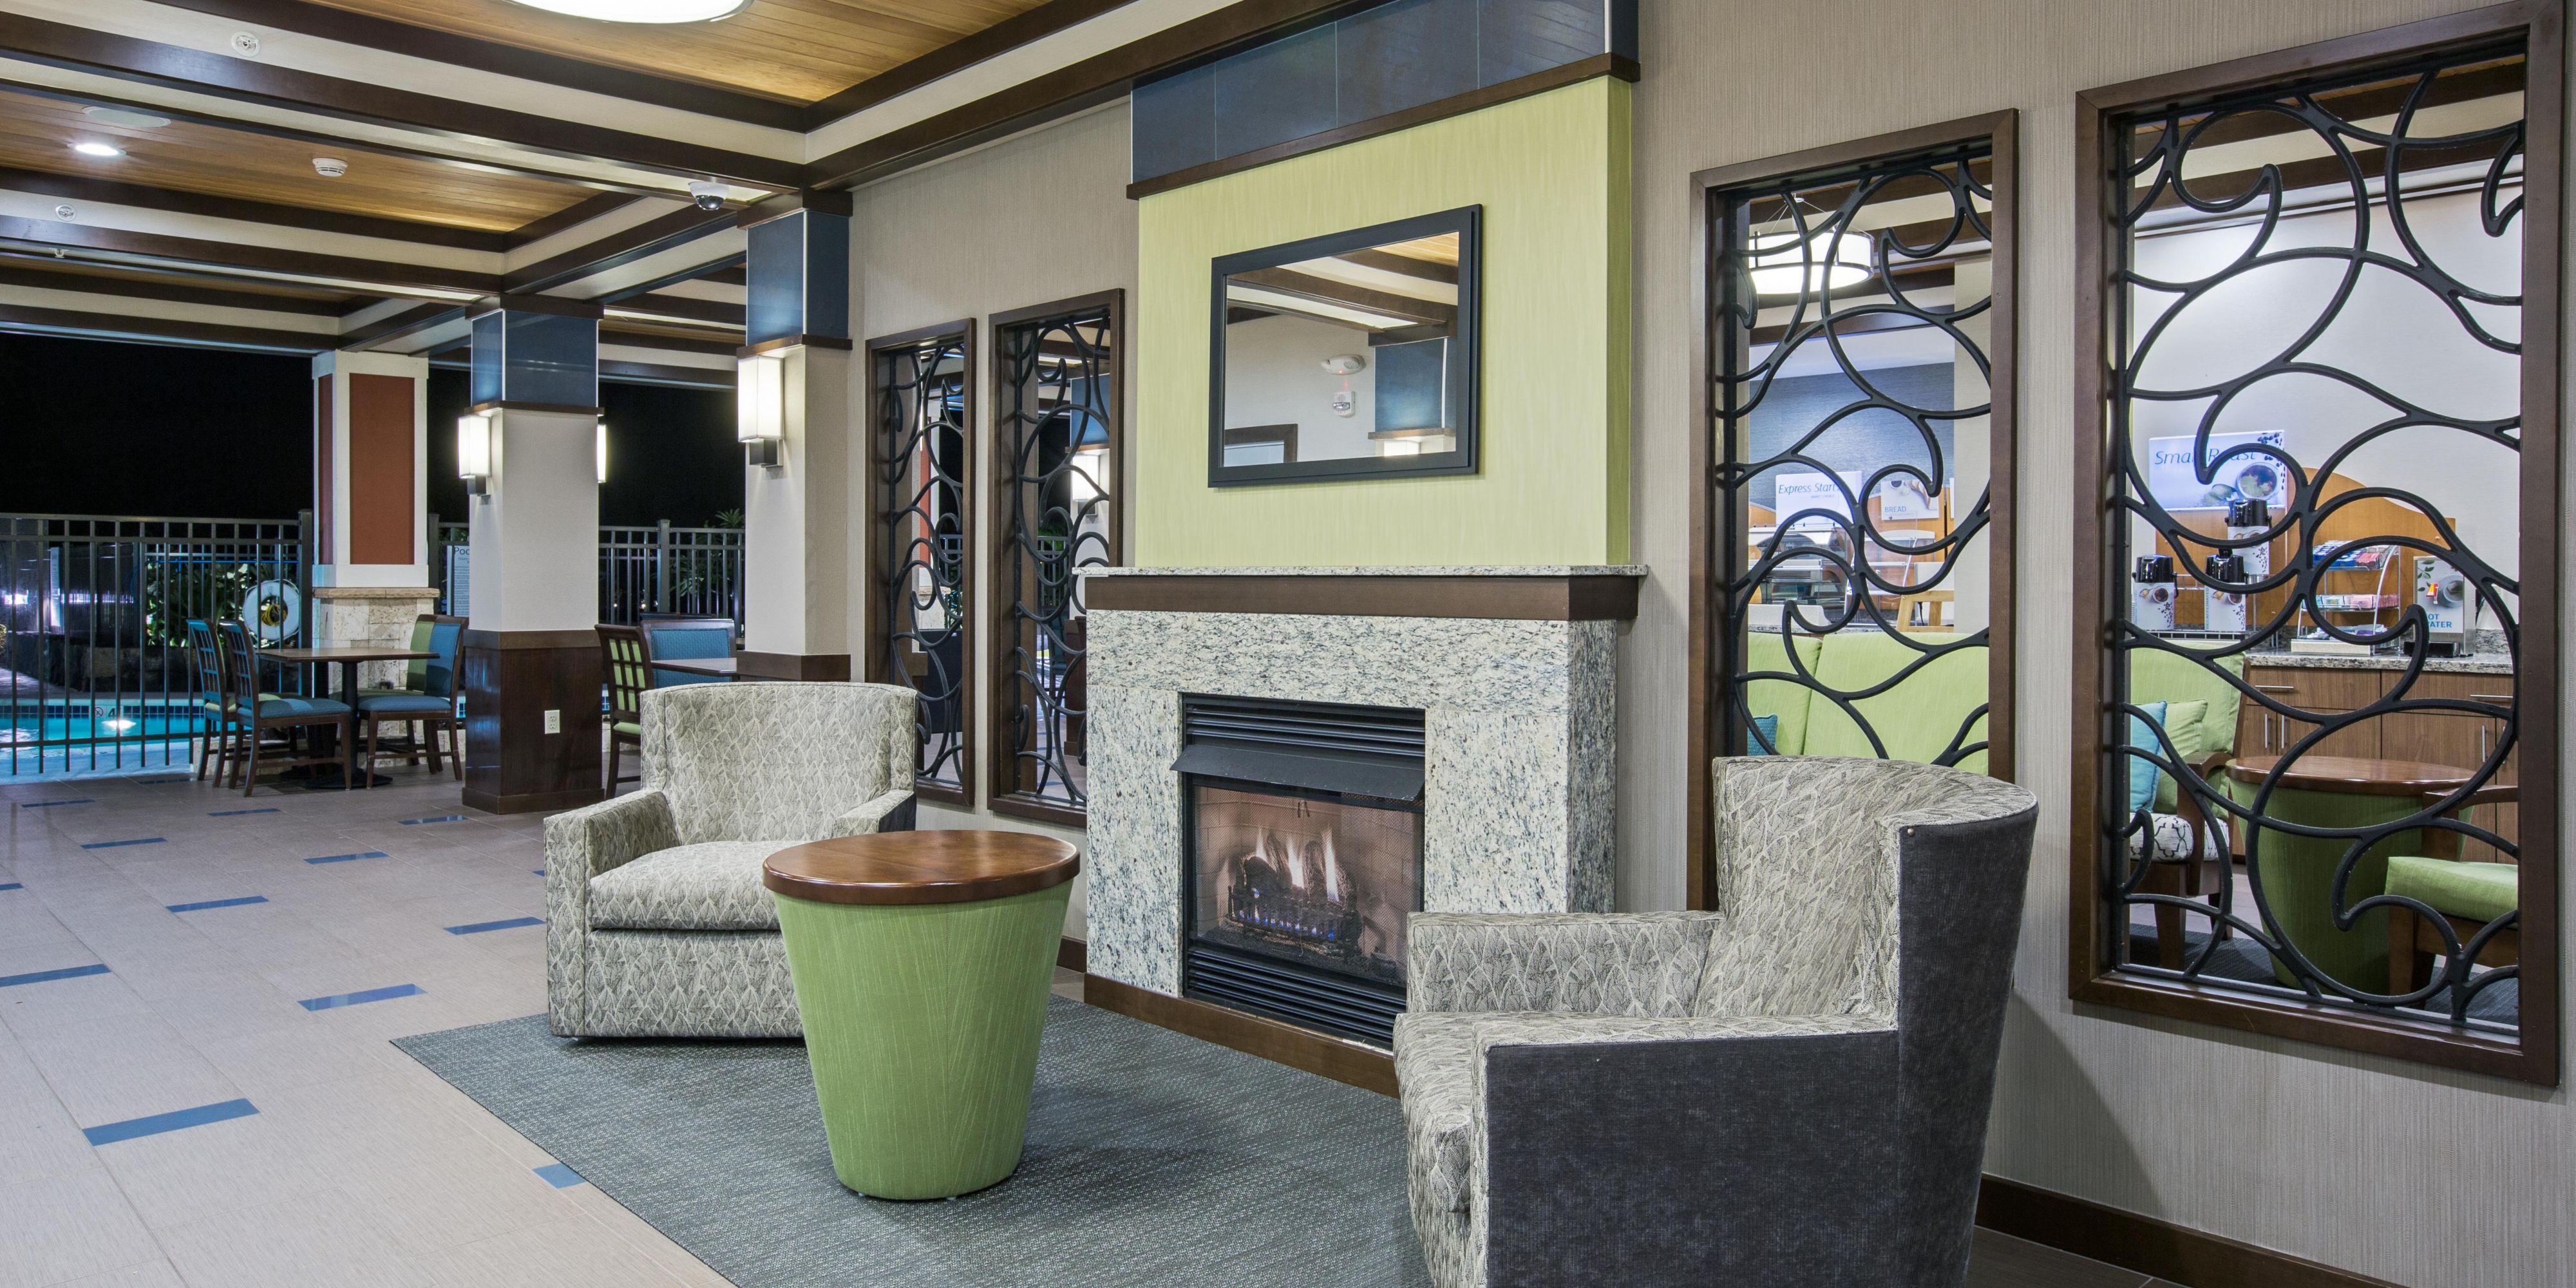 Holiday Inn Express & Suites Kailua-Kona Hotel by IHG